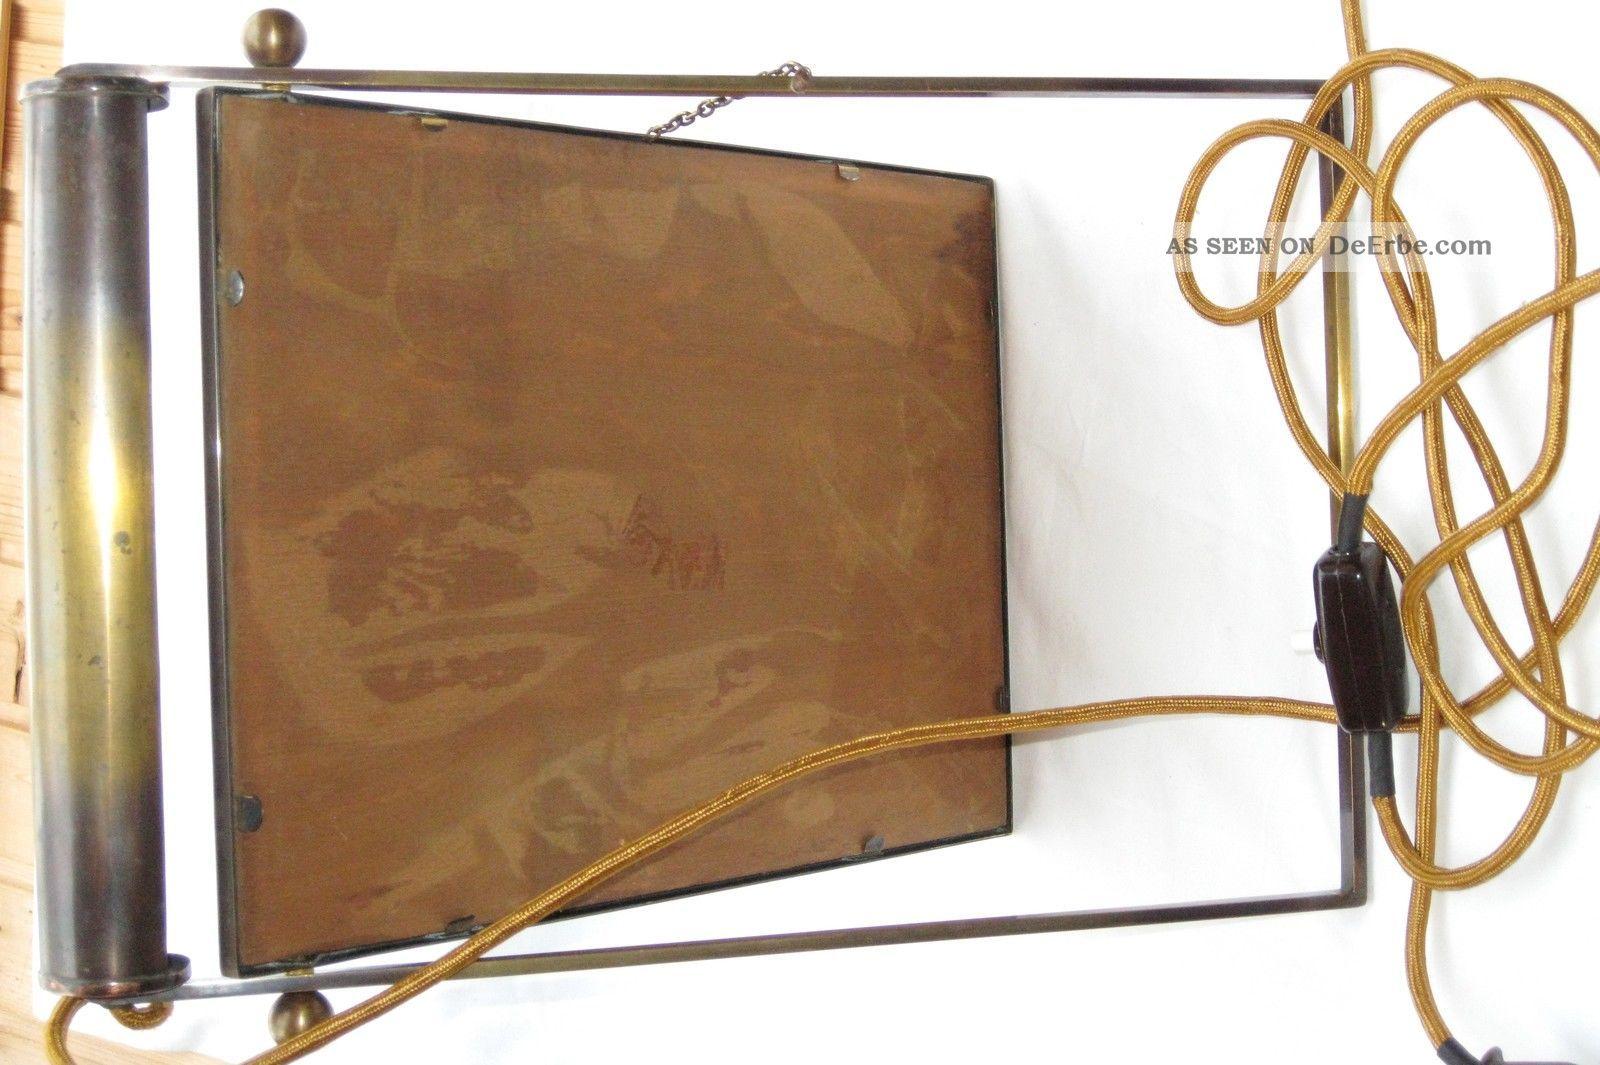 alte art deco bauhaus bilderrahmenlampe beleuchteter bilderrahmen um 1930 40. Black Bedroom Furniture Sets. Home Design Ideas